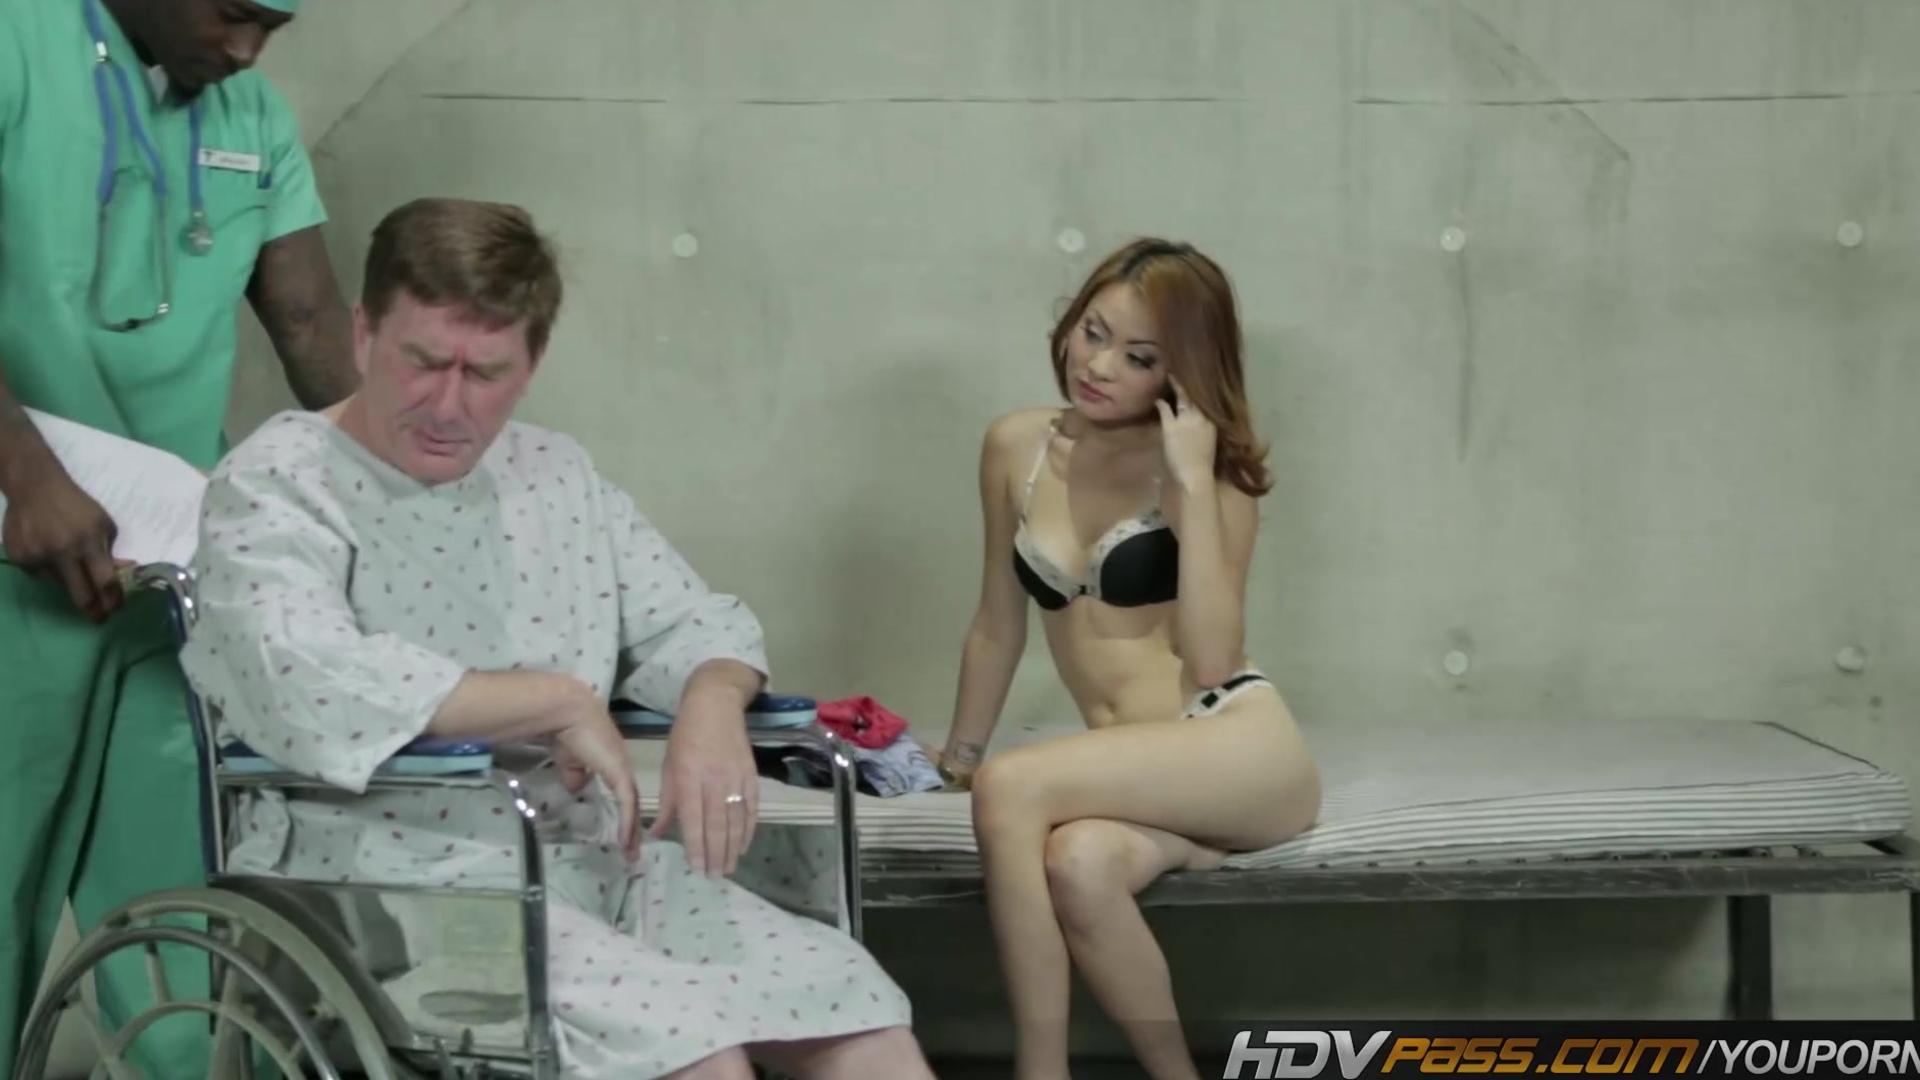 Asian teen nurse Kim Blossom fucks and sucks massive black cock in front of cuckold